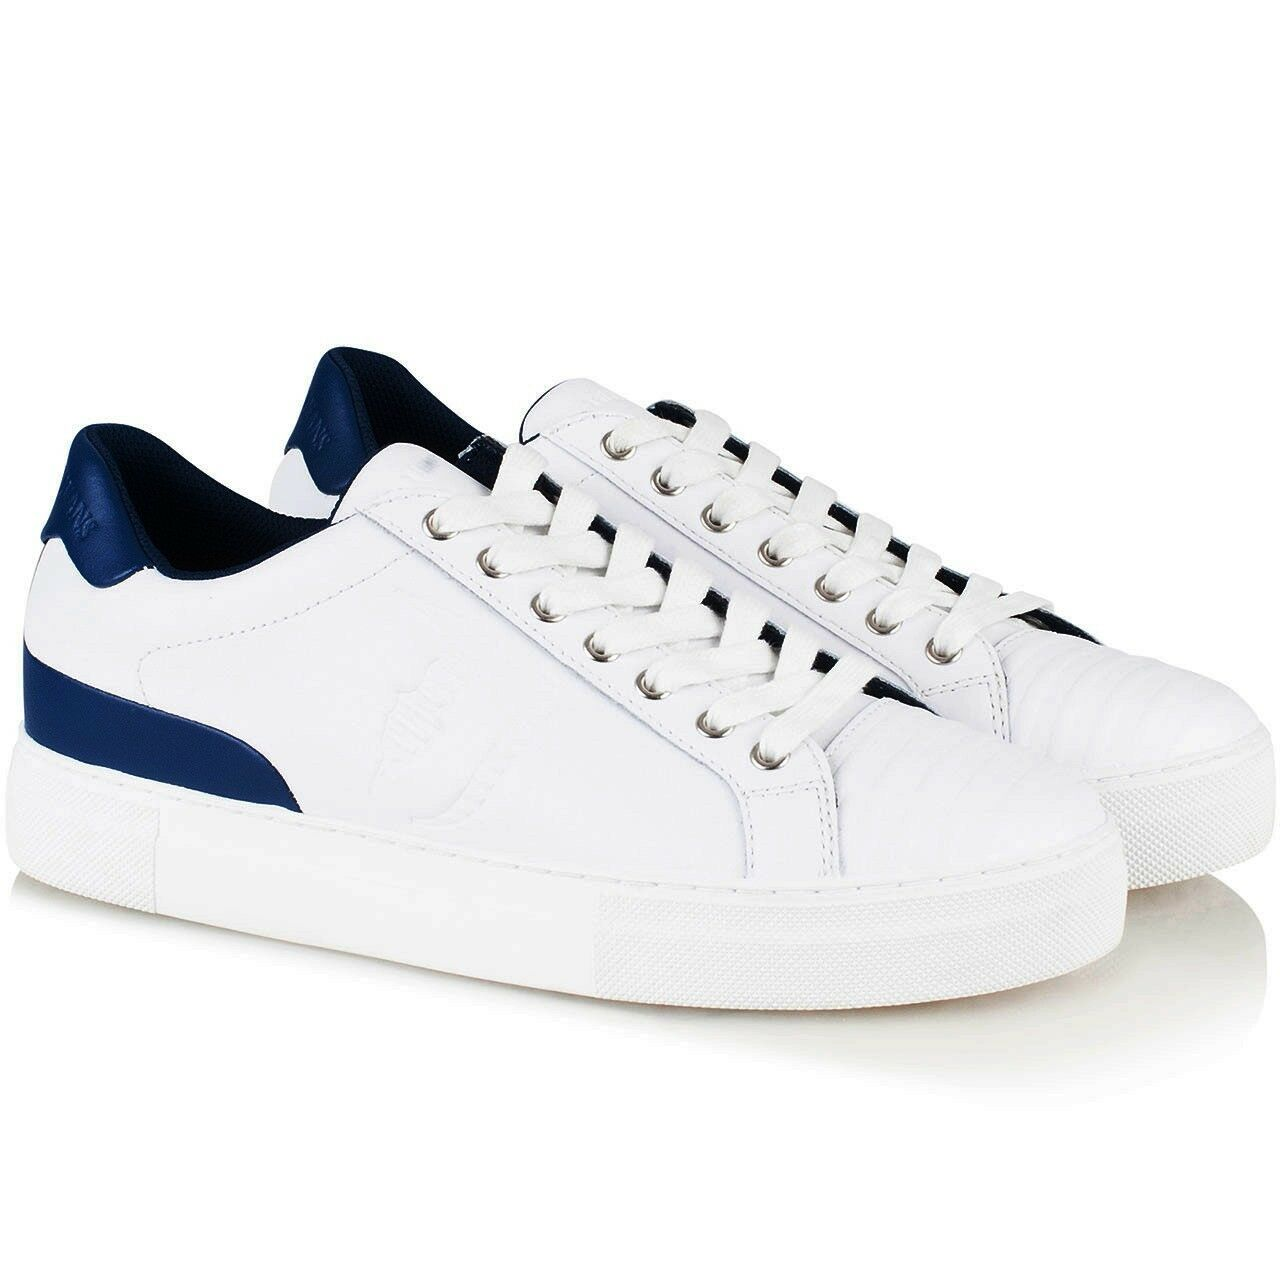 TRUSSARDI Jeans Sneakers men EU 44 Optical White blue Navy 100% Pelle List